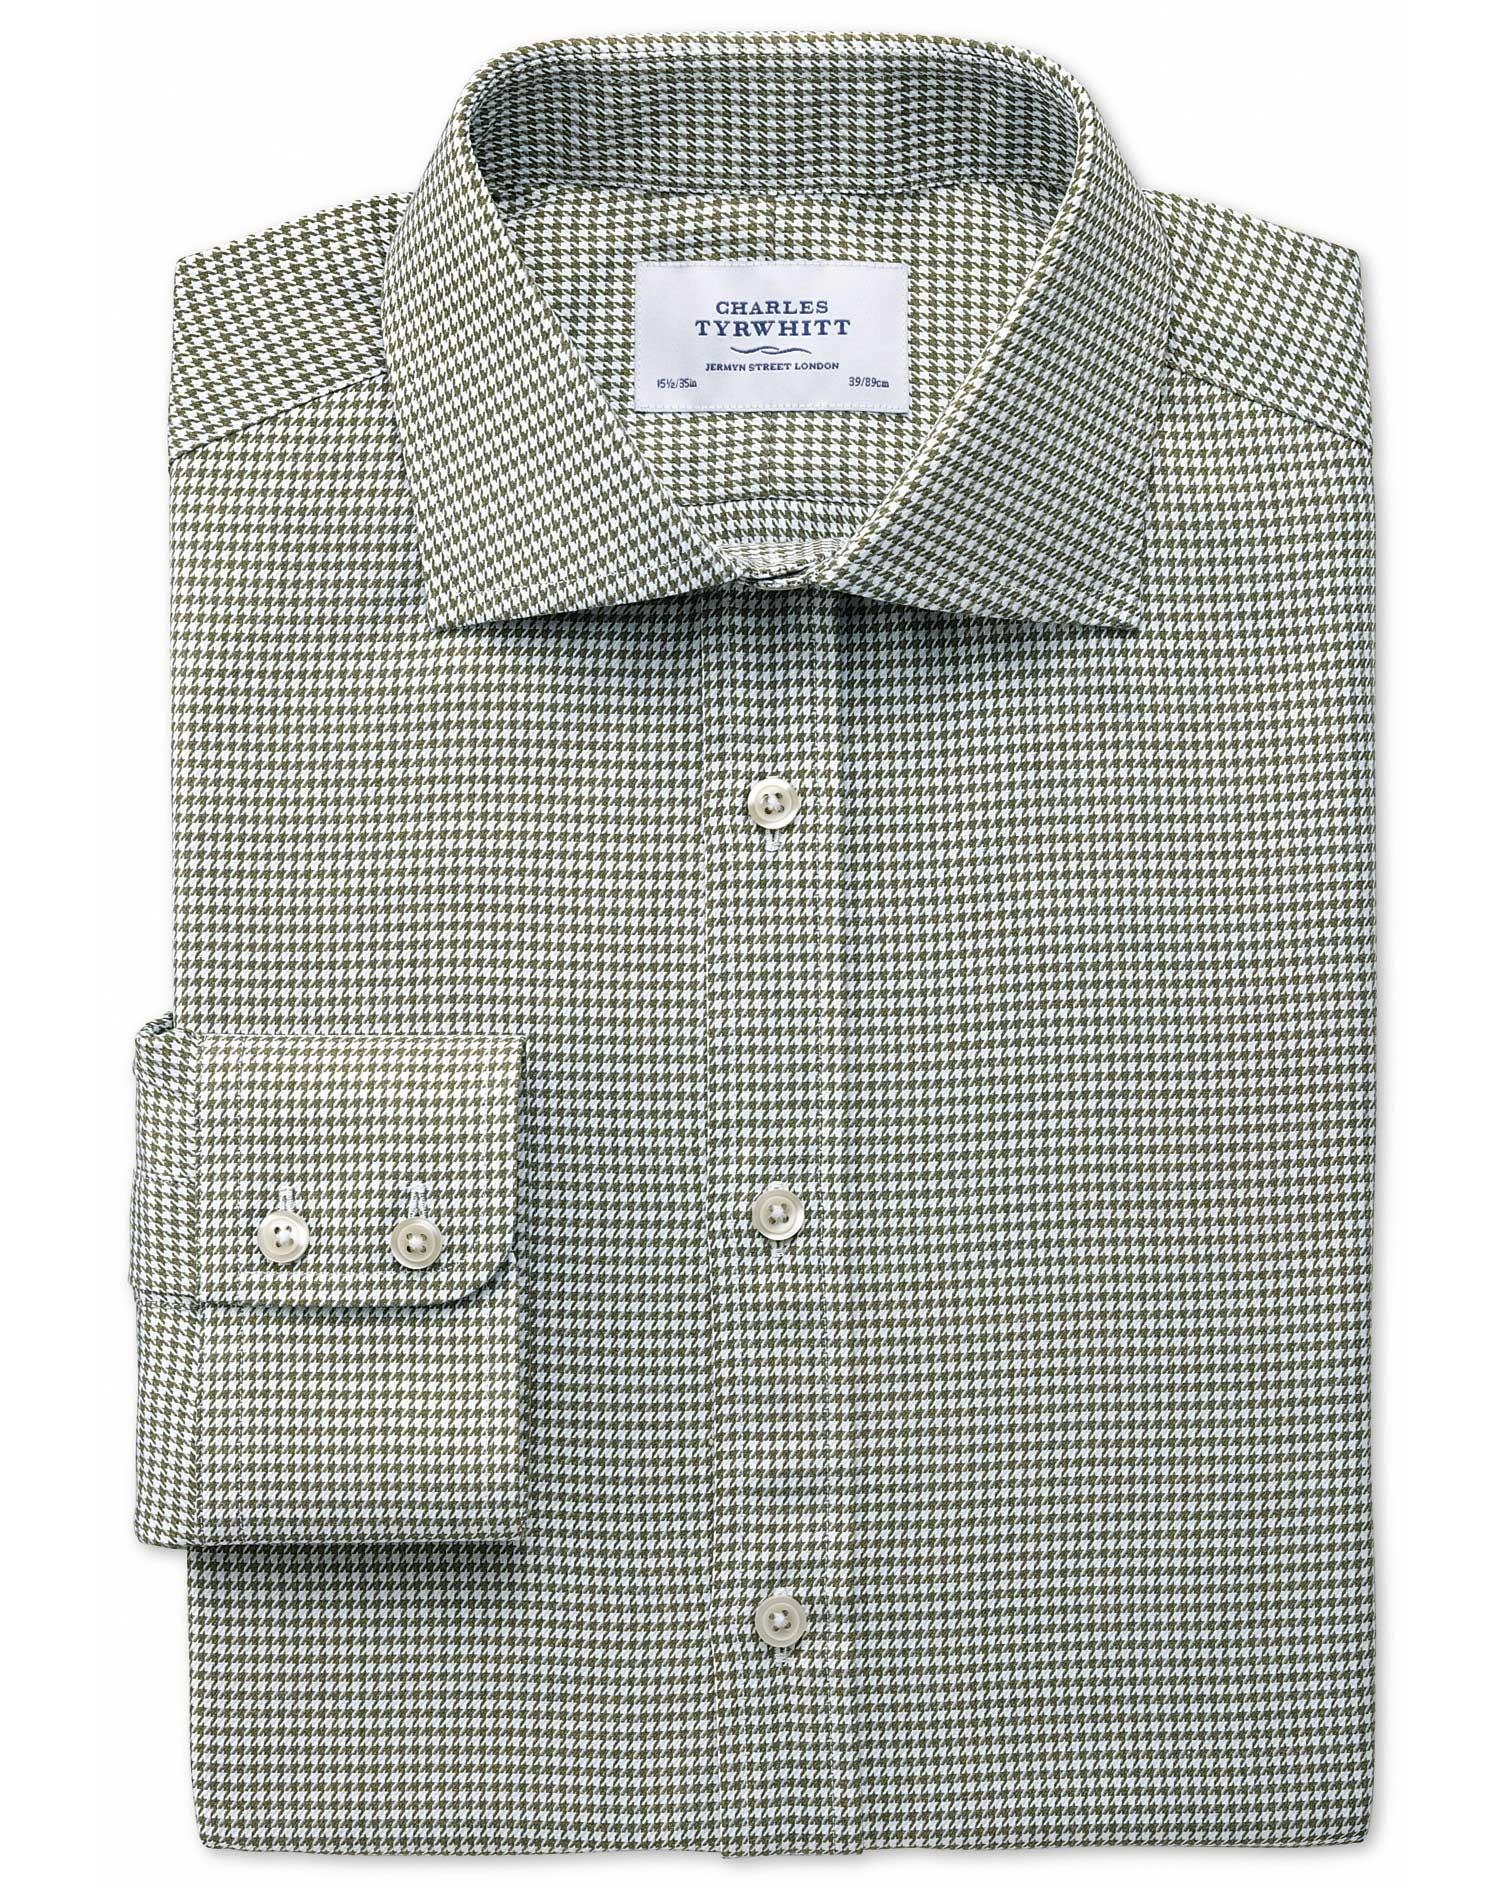 Extra Slim Fit Semi-Cutaway Collar Melange Puppytooth Khaki Cotton Formal Shirt Single Cuff Size 17.